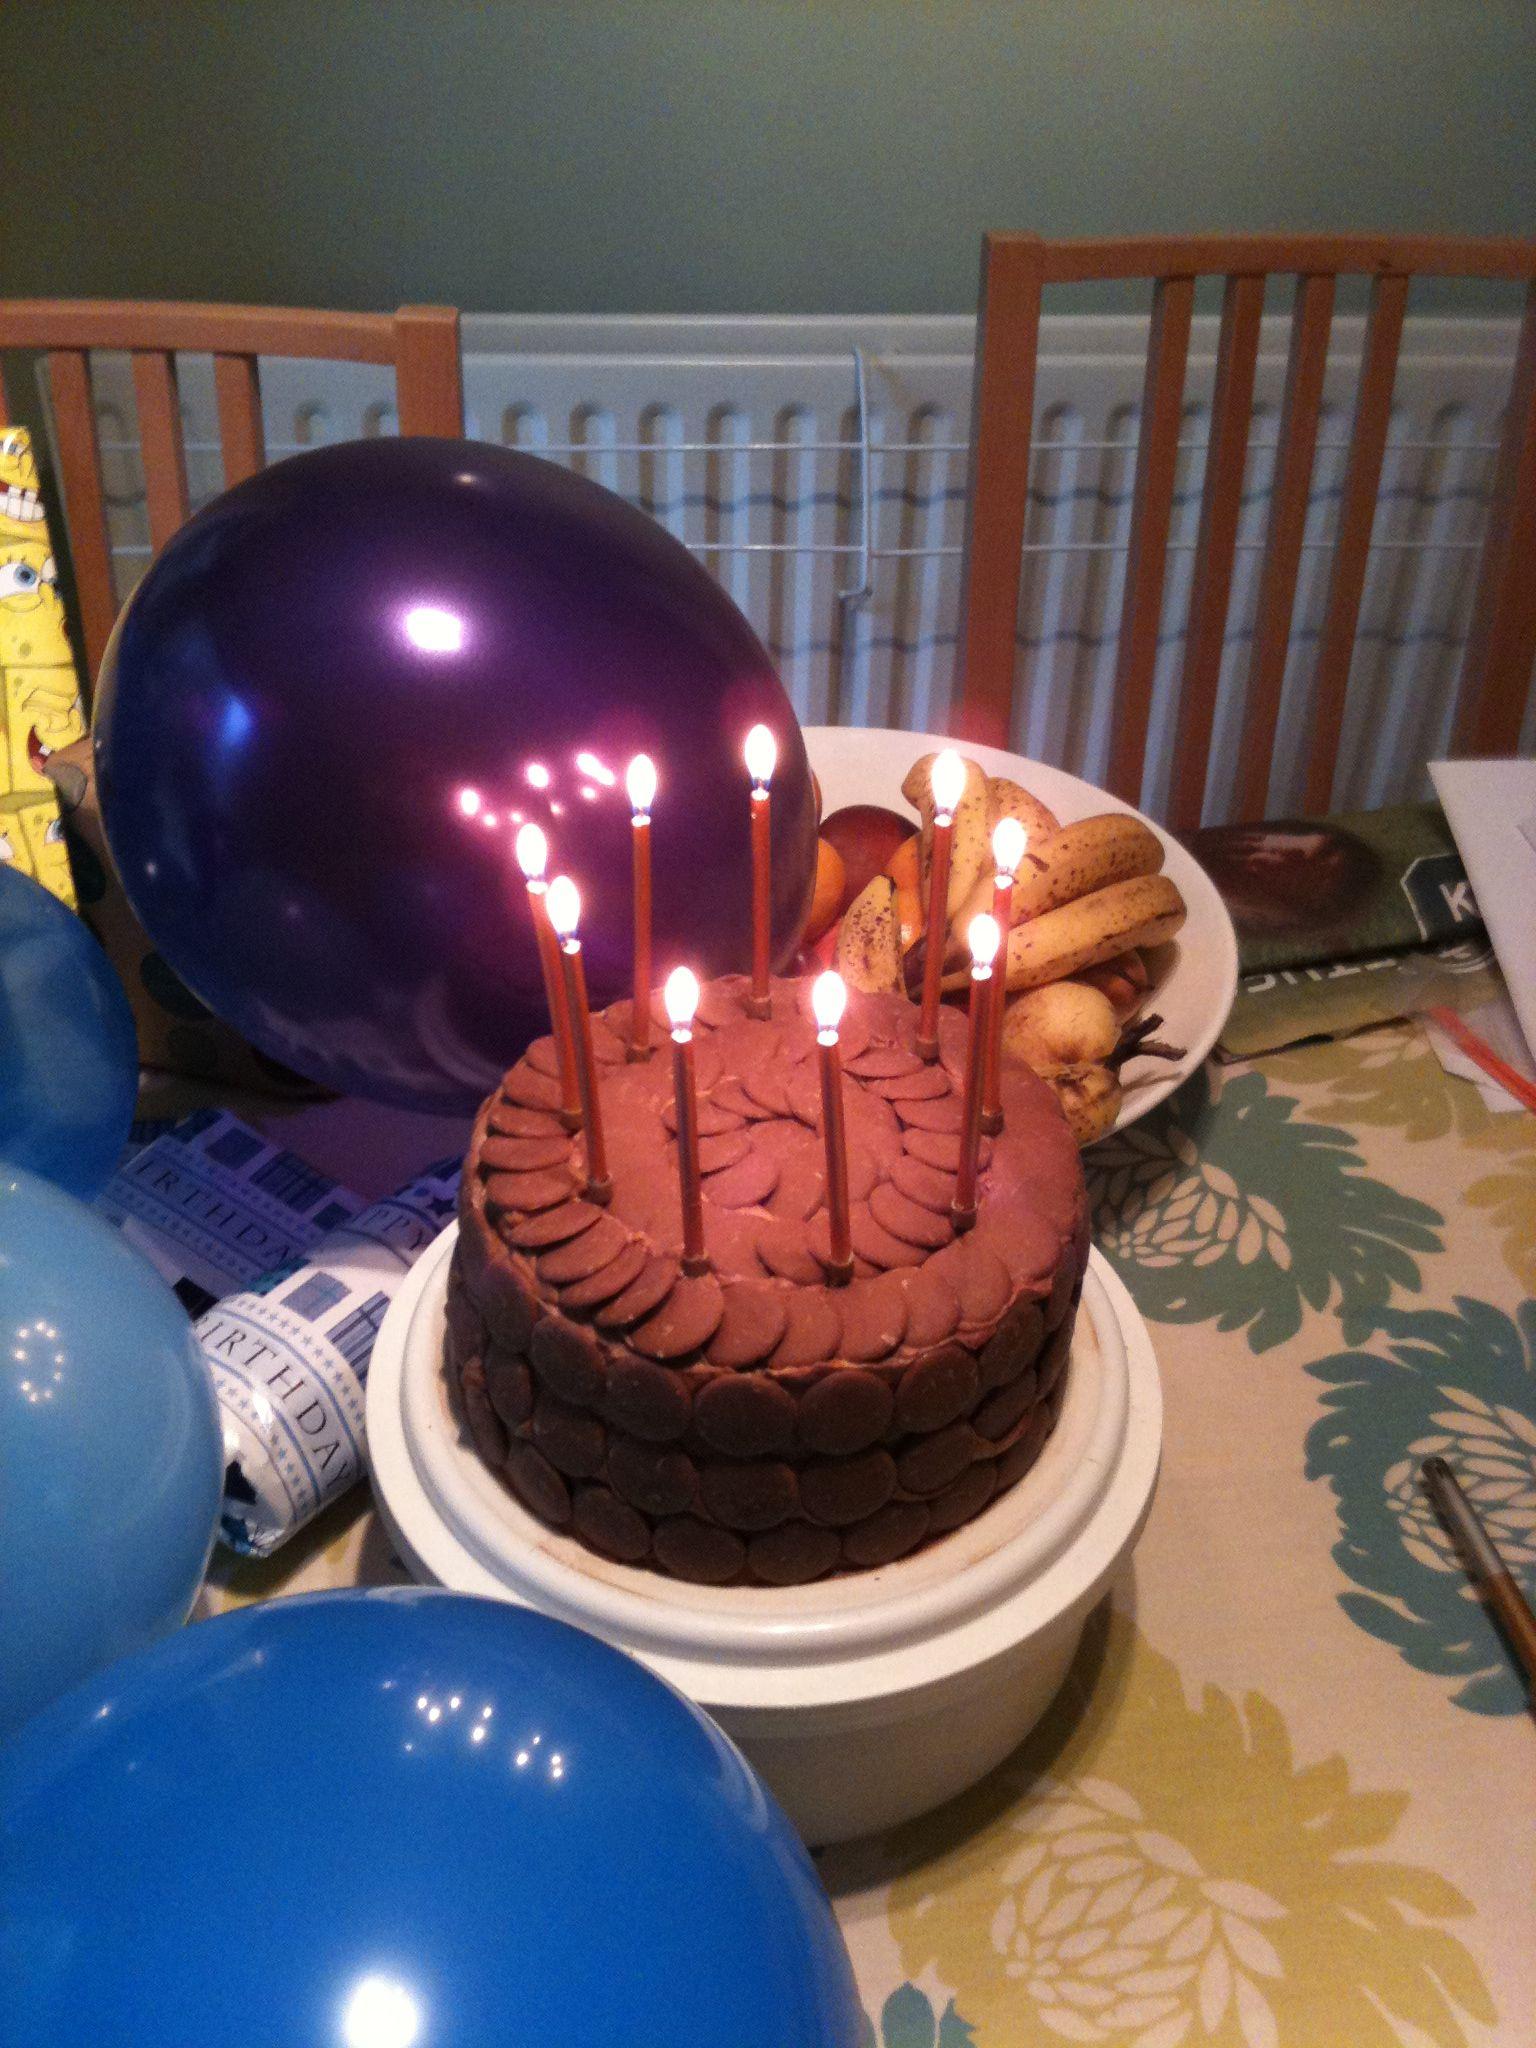 Johns birthday cake cake birthday candles birthday cake